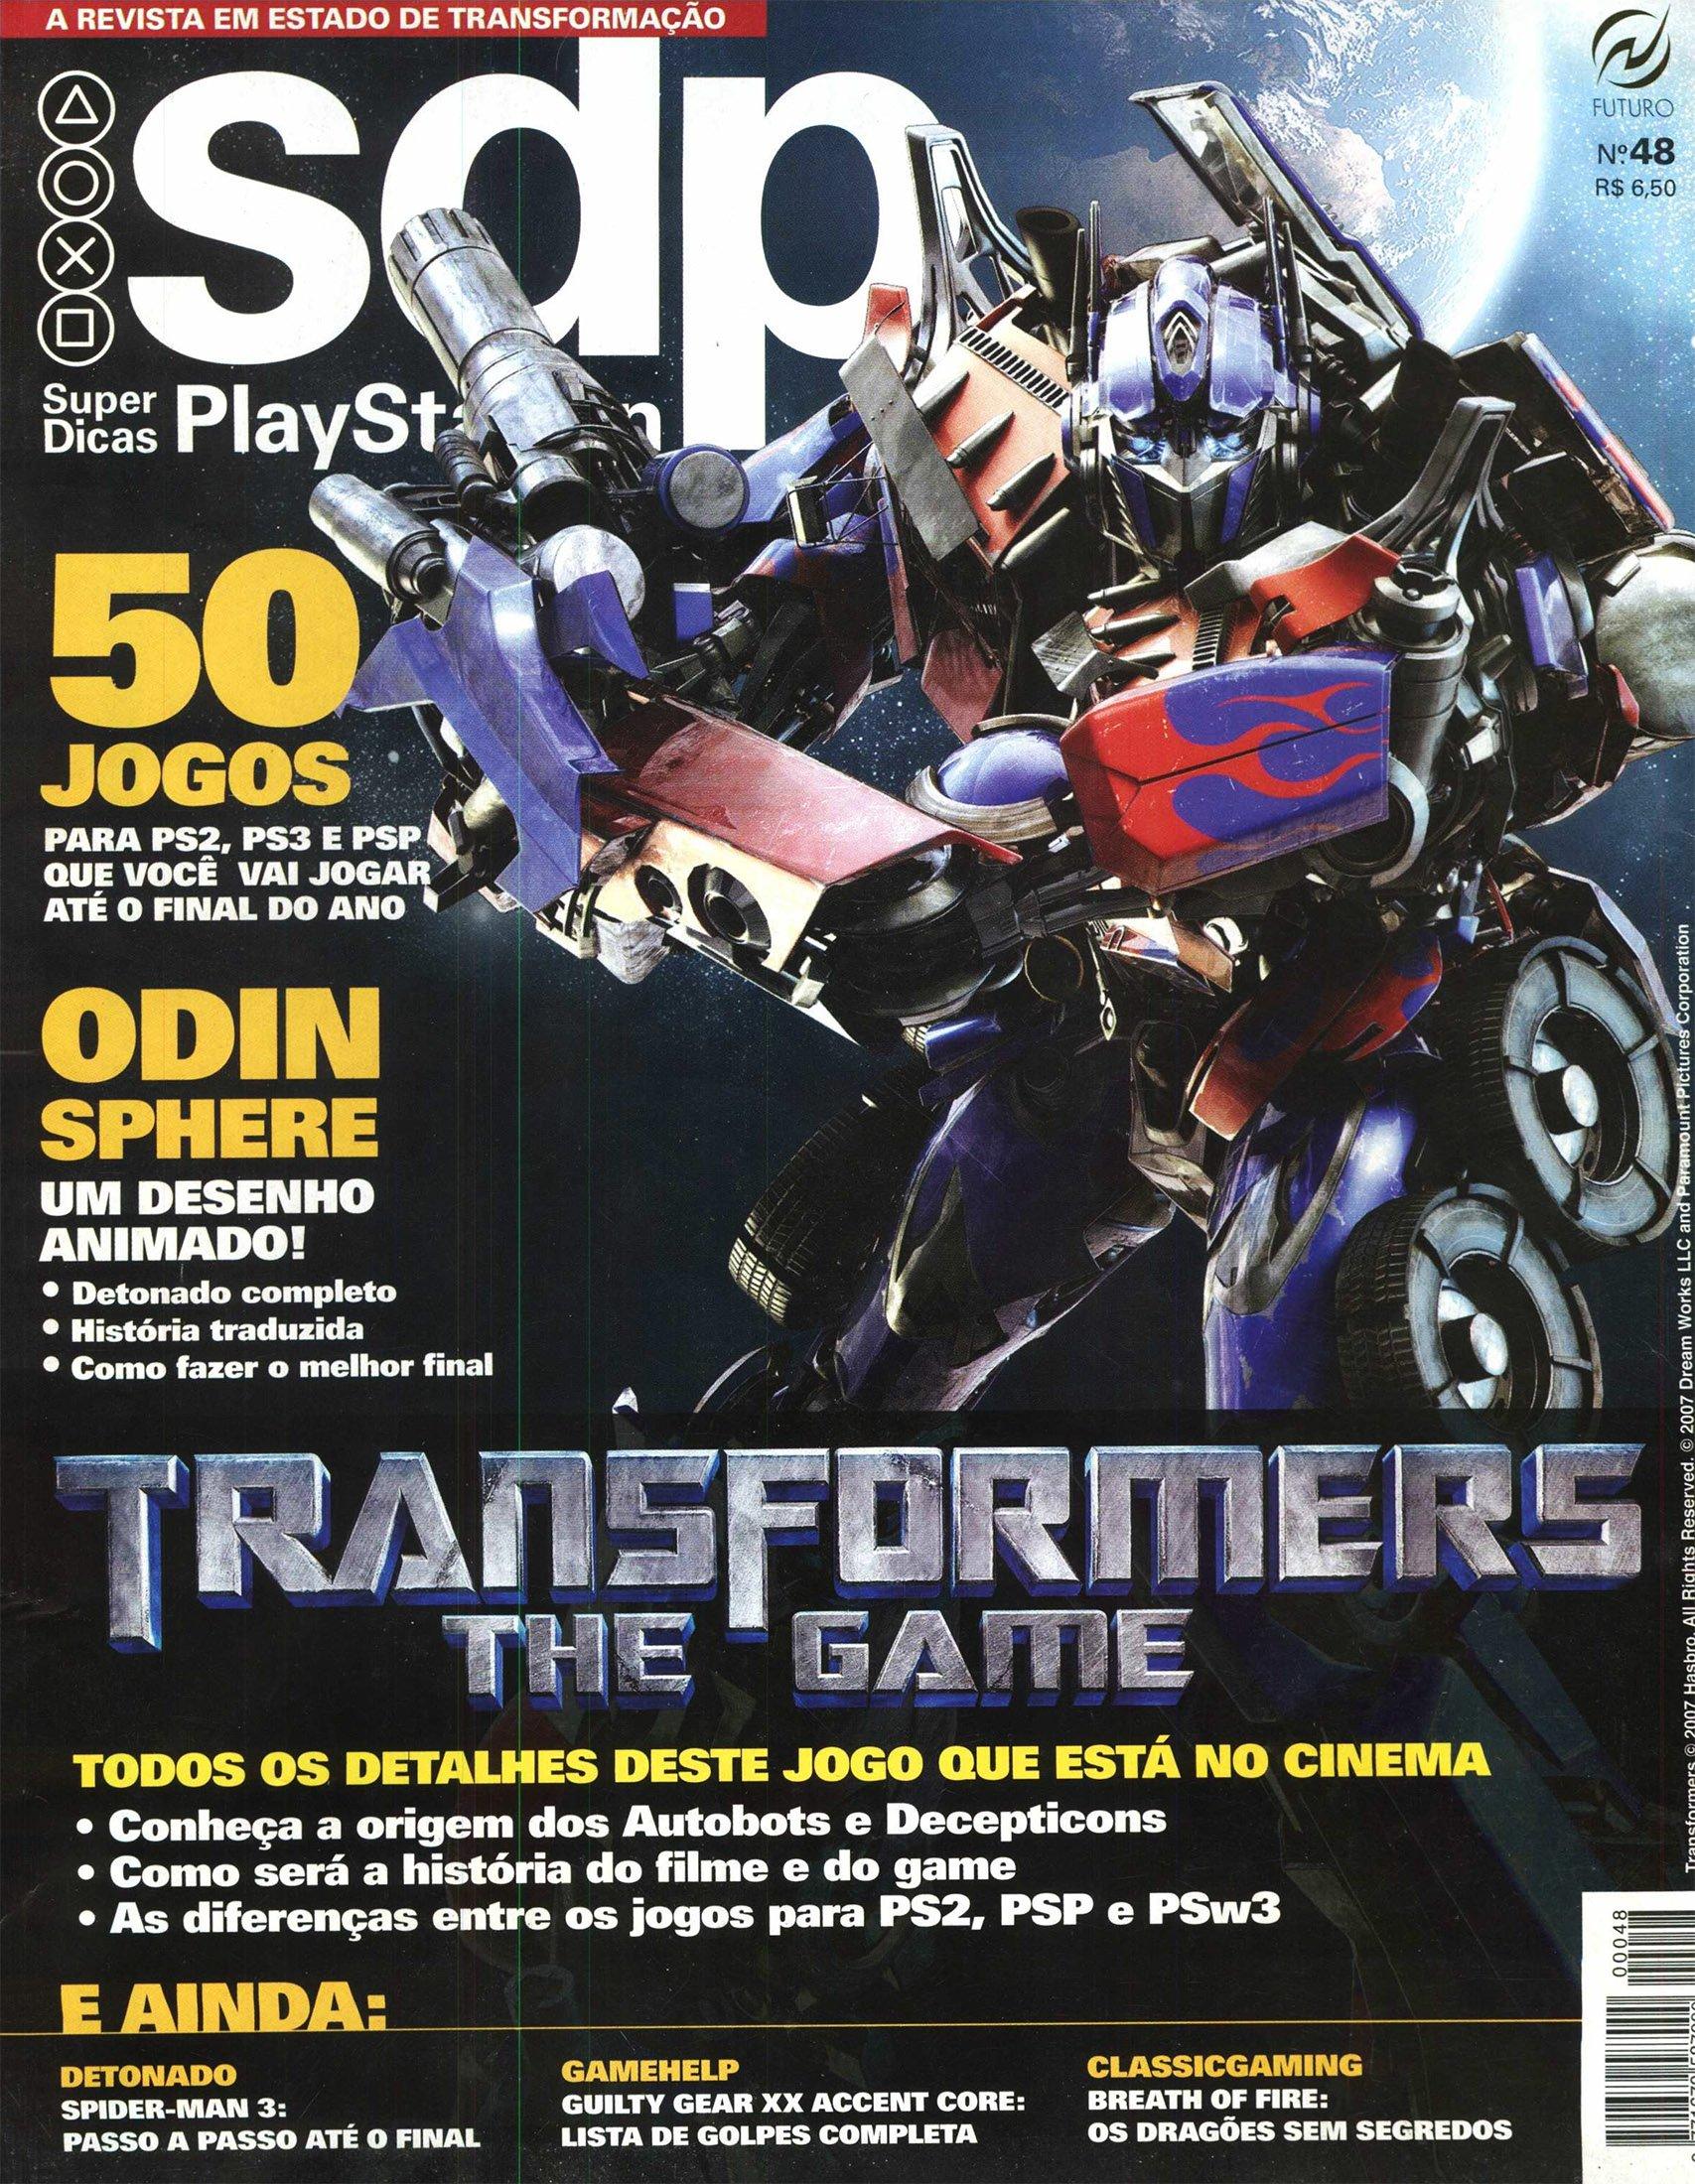 Super Dicas Playstation 48 (July 2007)